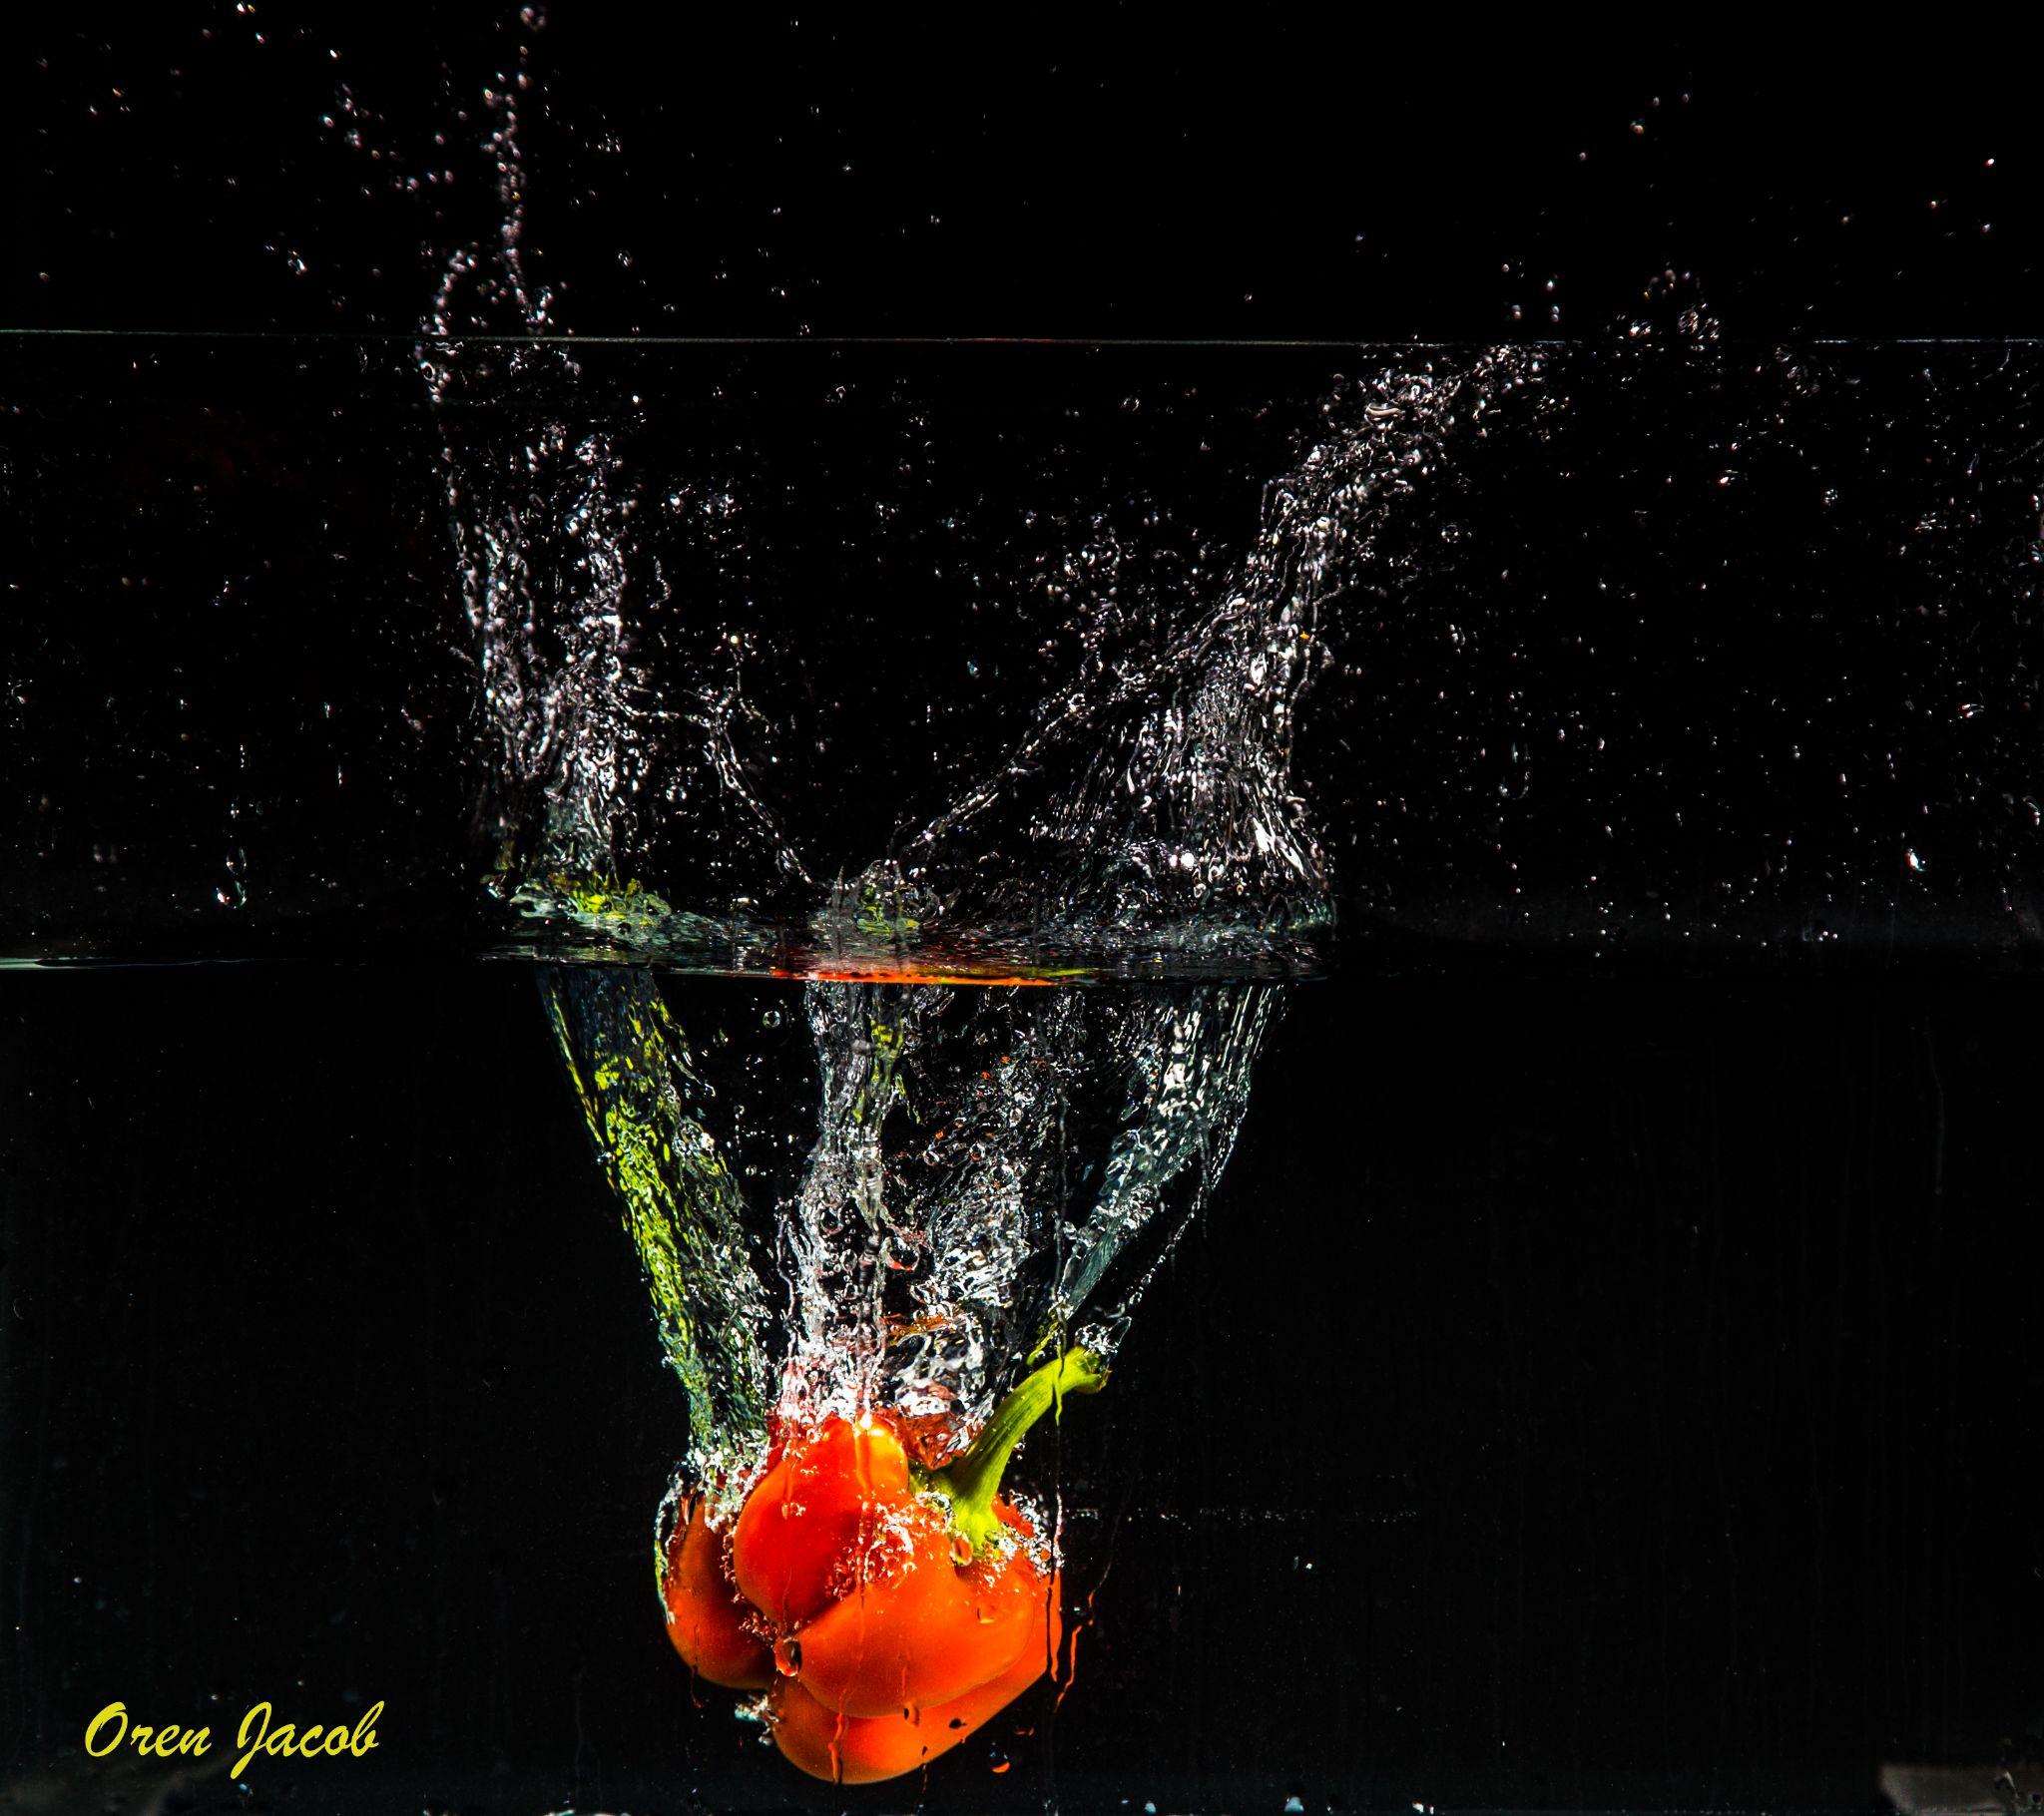 Soflas by oren.yacob